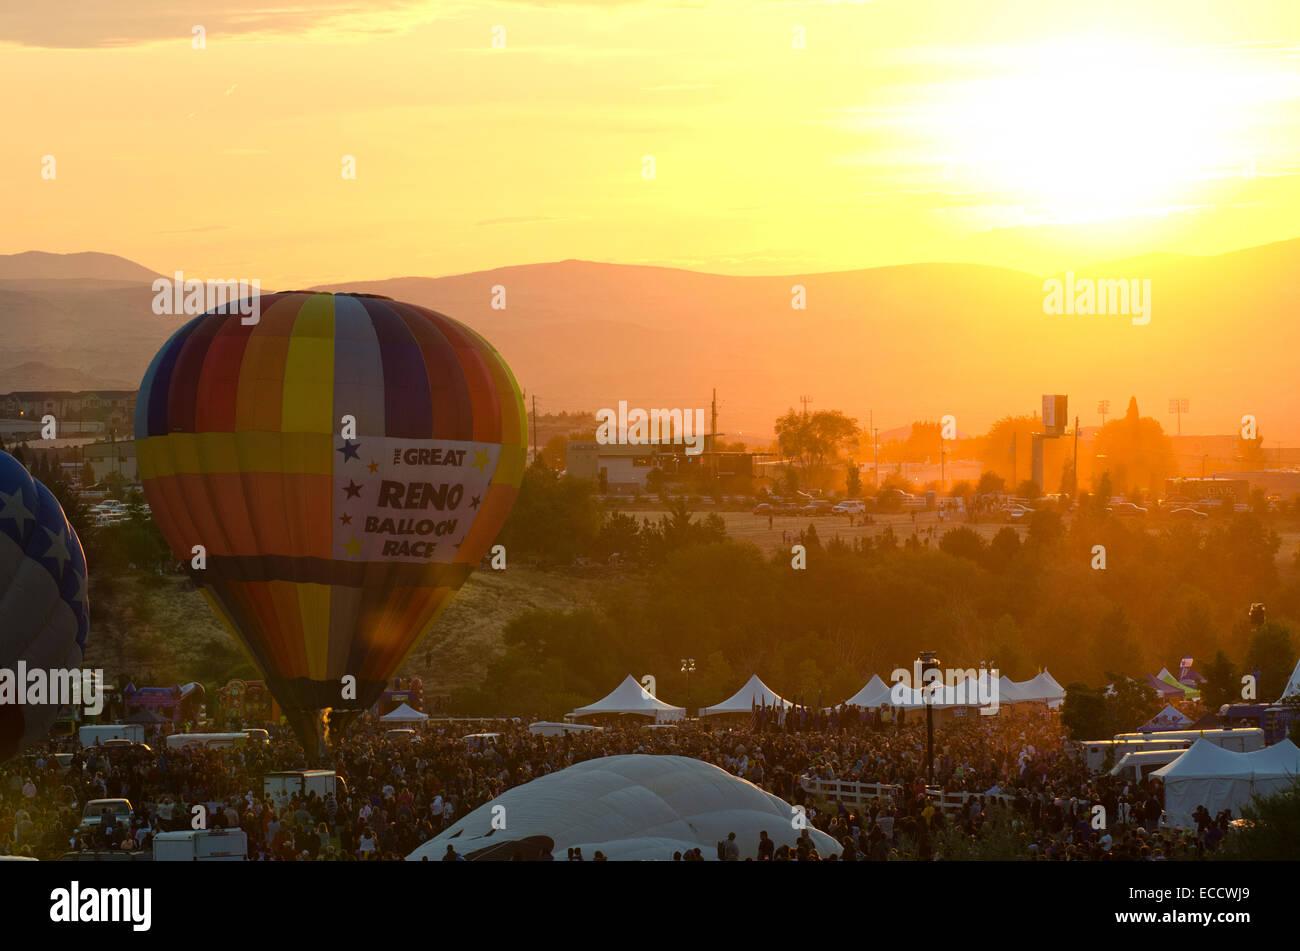 Dawn patrol at the Great Reno Balloon Races in Reno, Nevada. - Stock Image